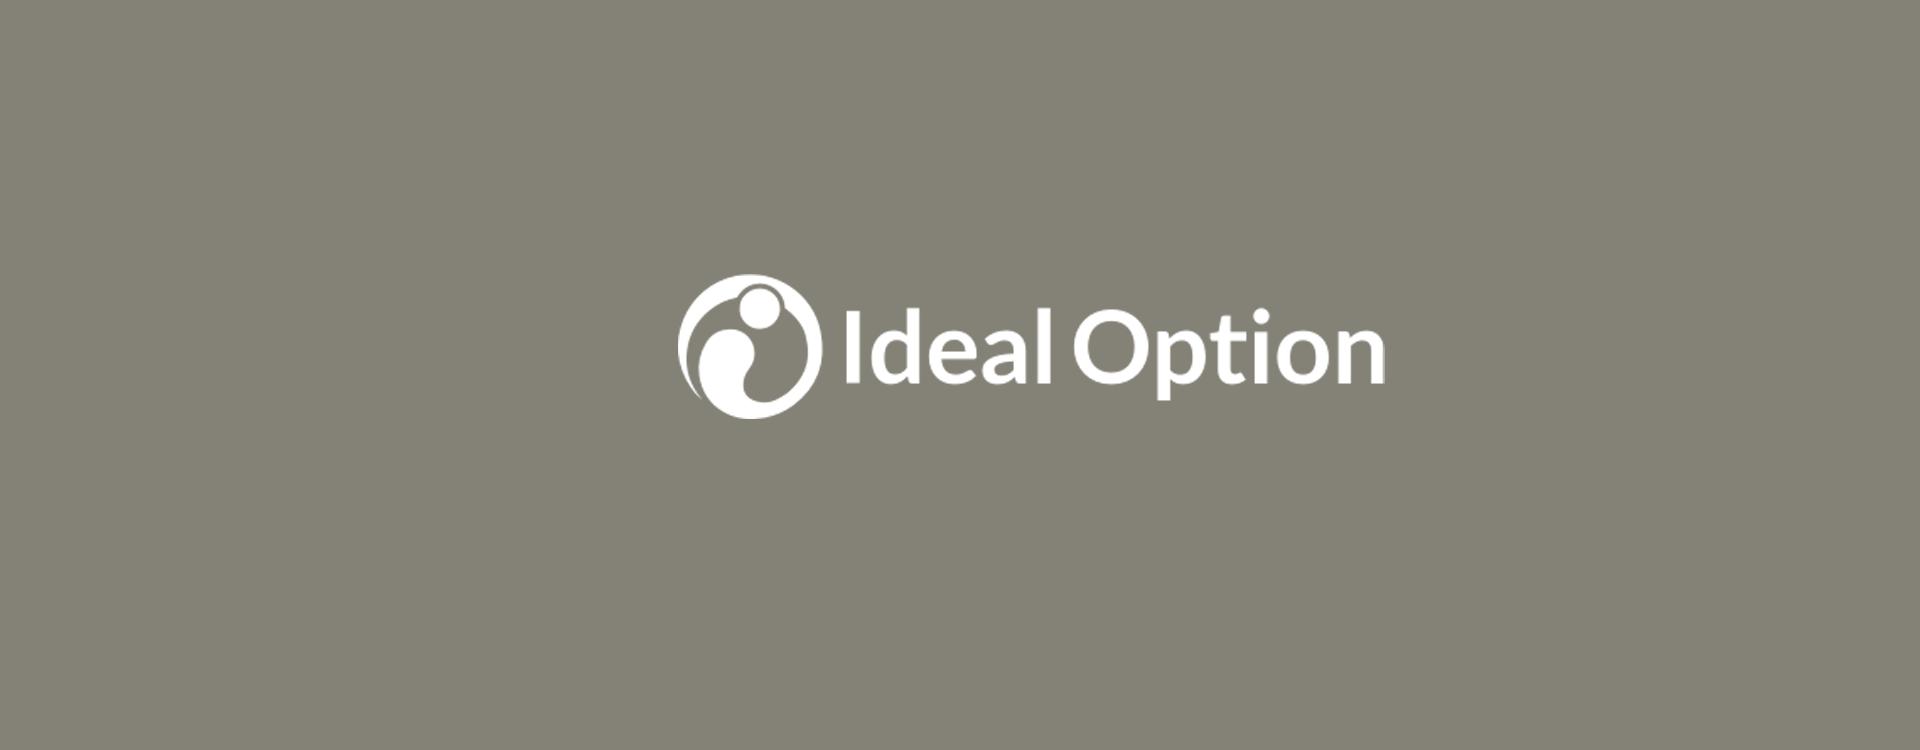 Ideal Option